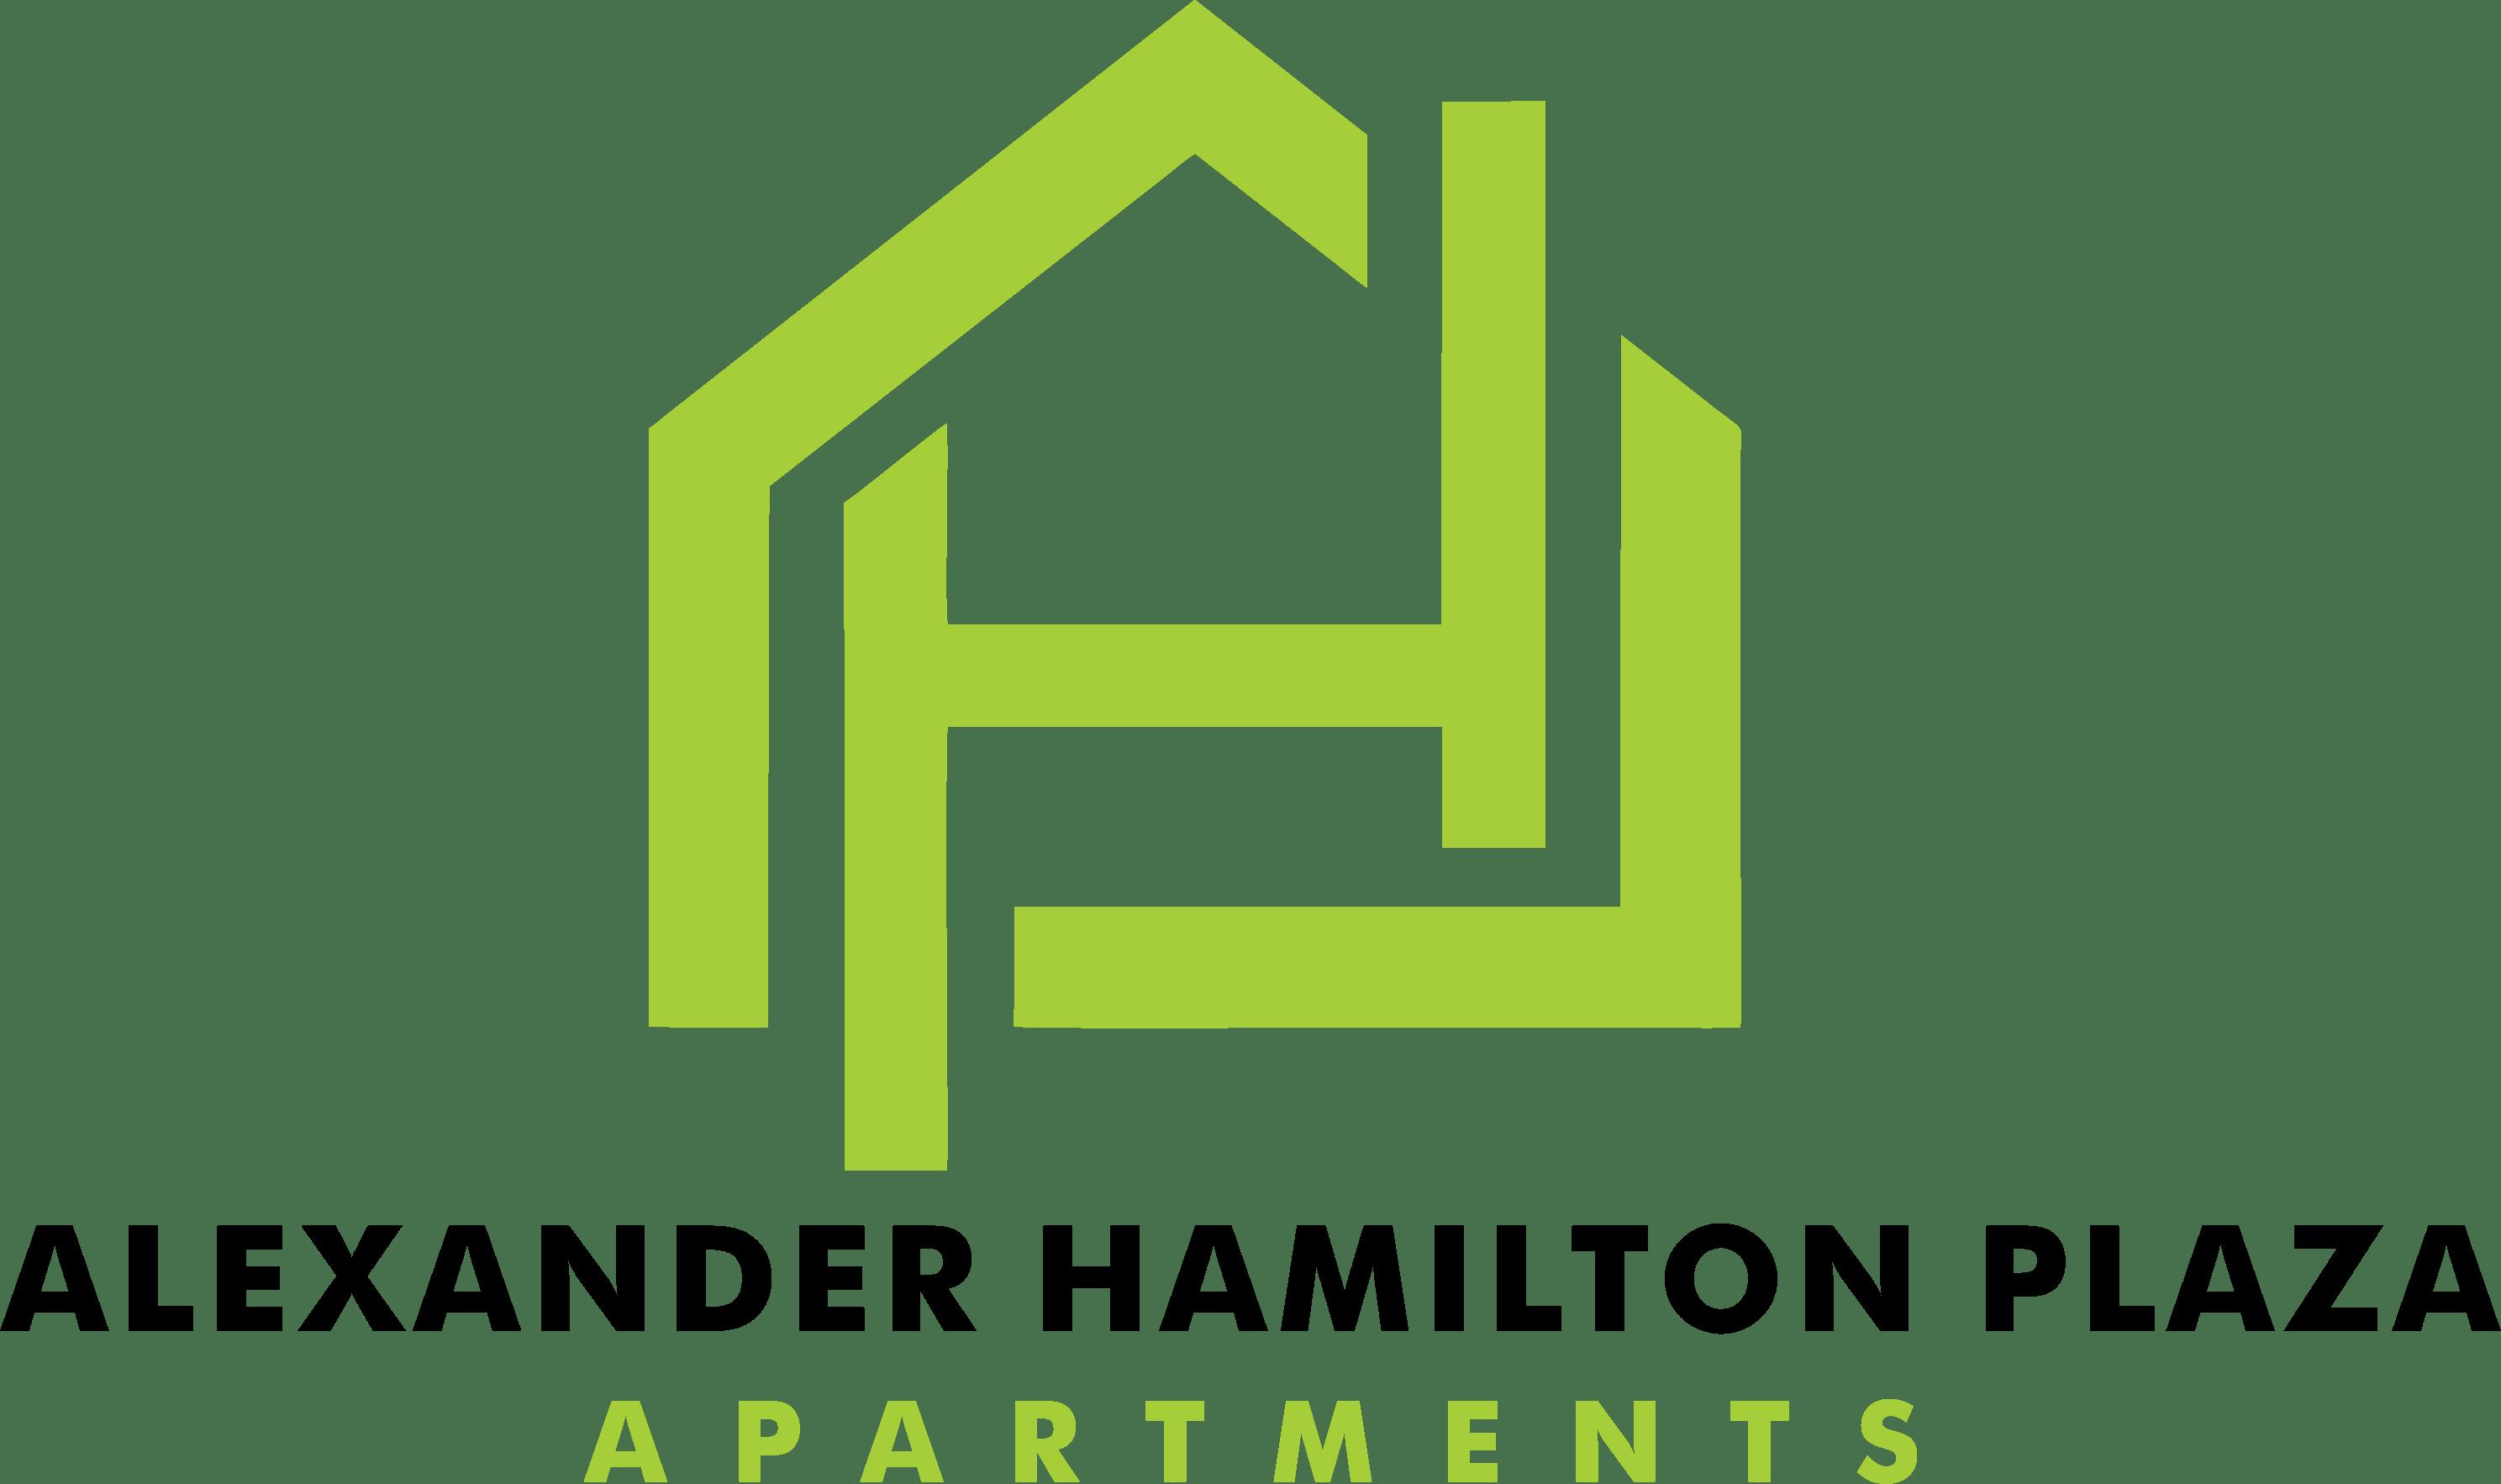 Alexander Hamilton Plaza Apartments